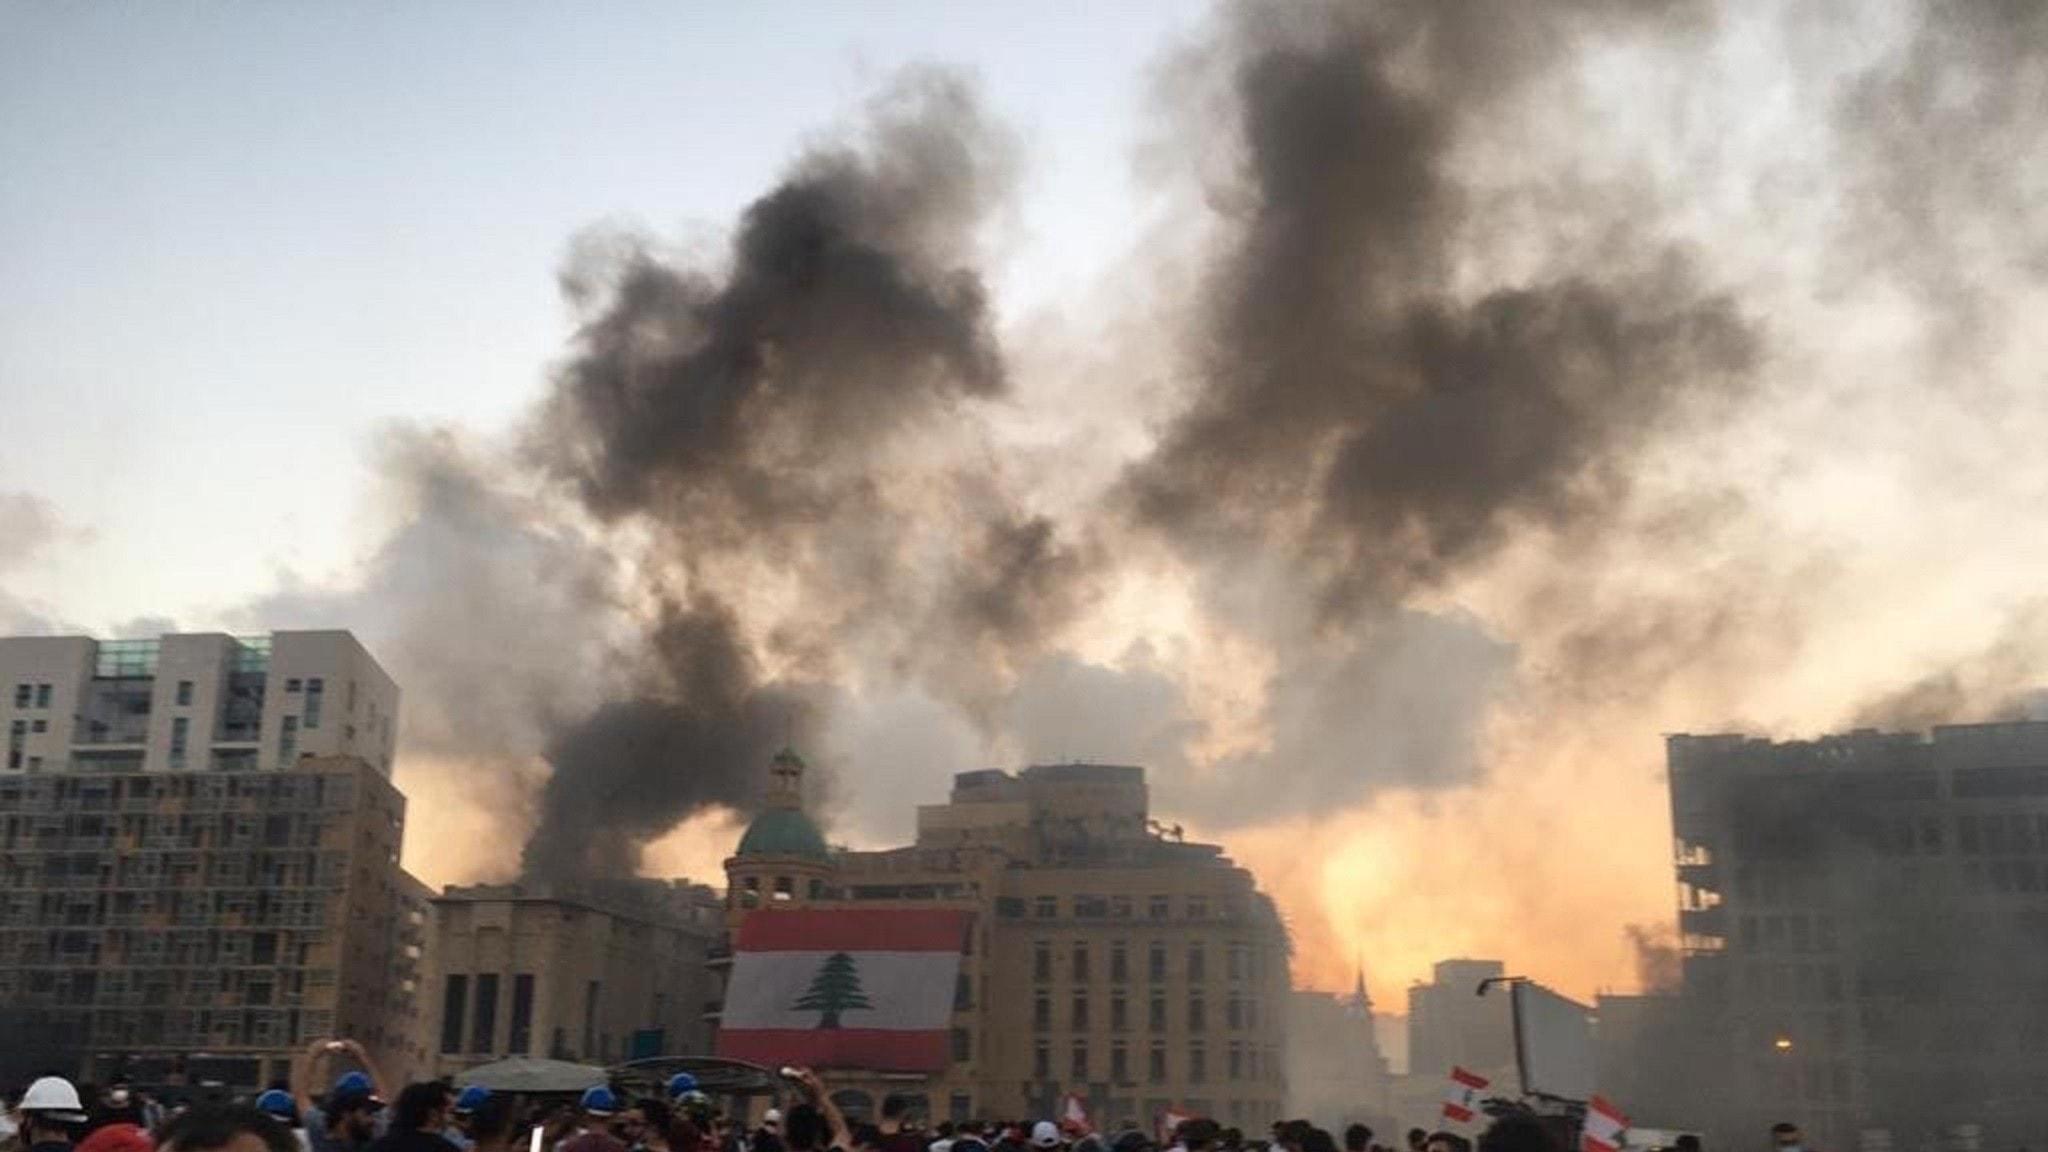 Libanon på väg mot helvetet